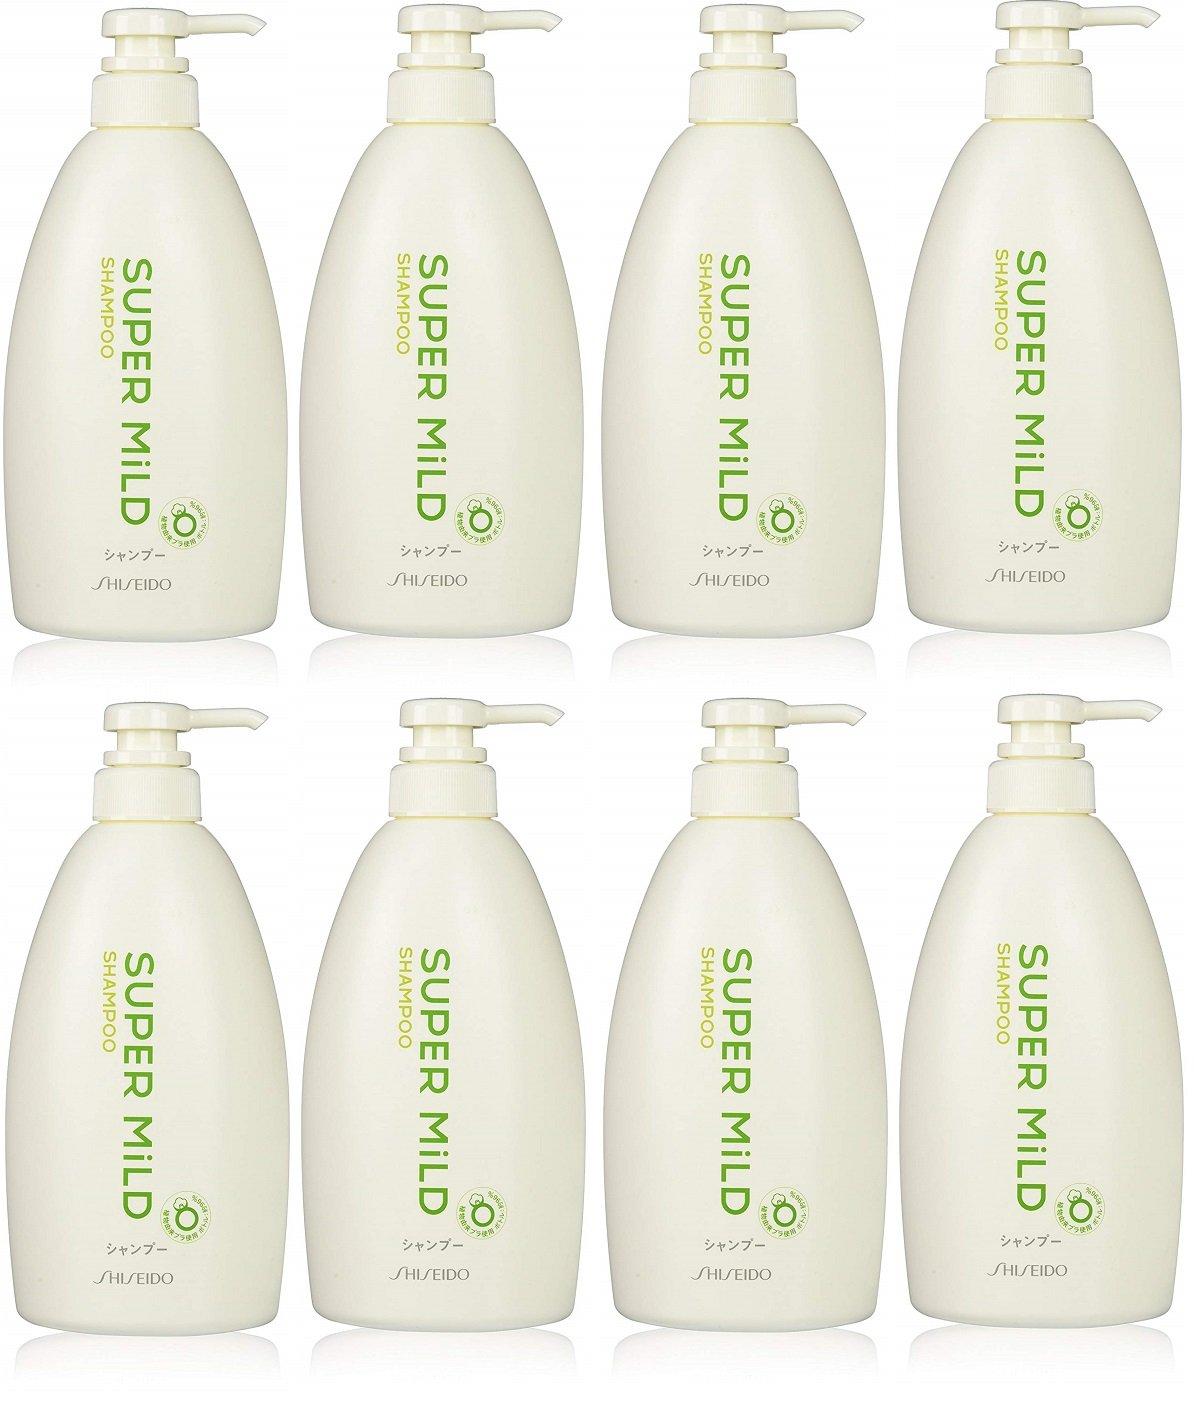 Bulk Purchase Super Mild Jumbo Shampoo Gifts 600mlx8 Outstanding